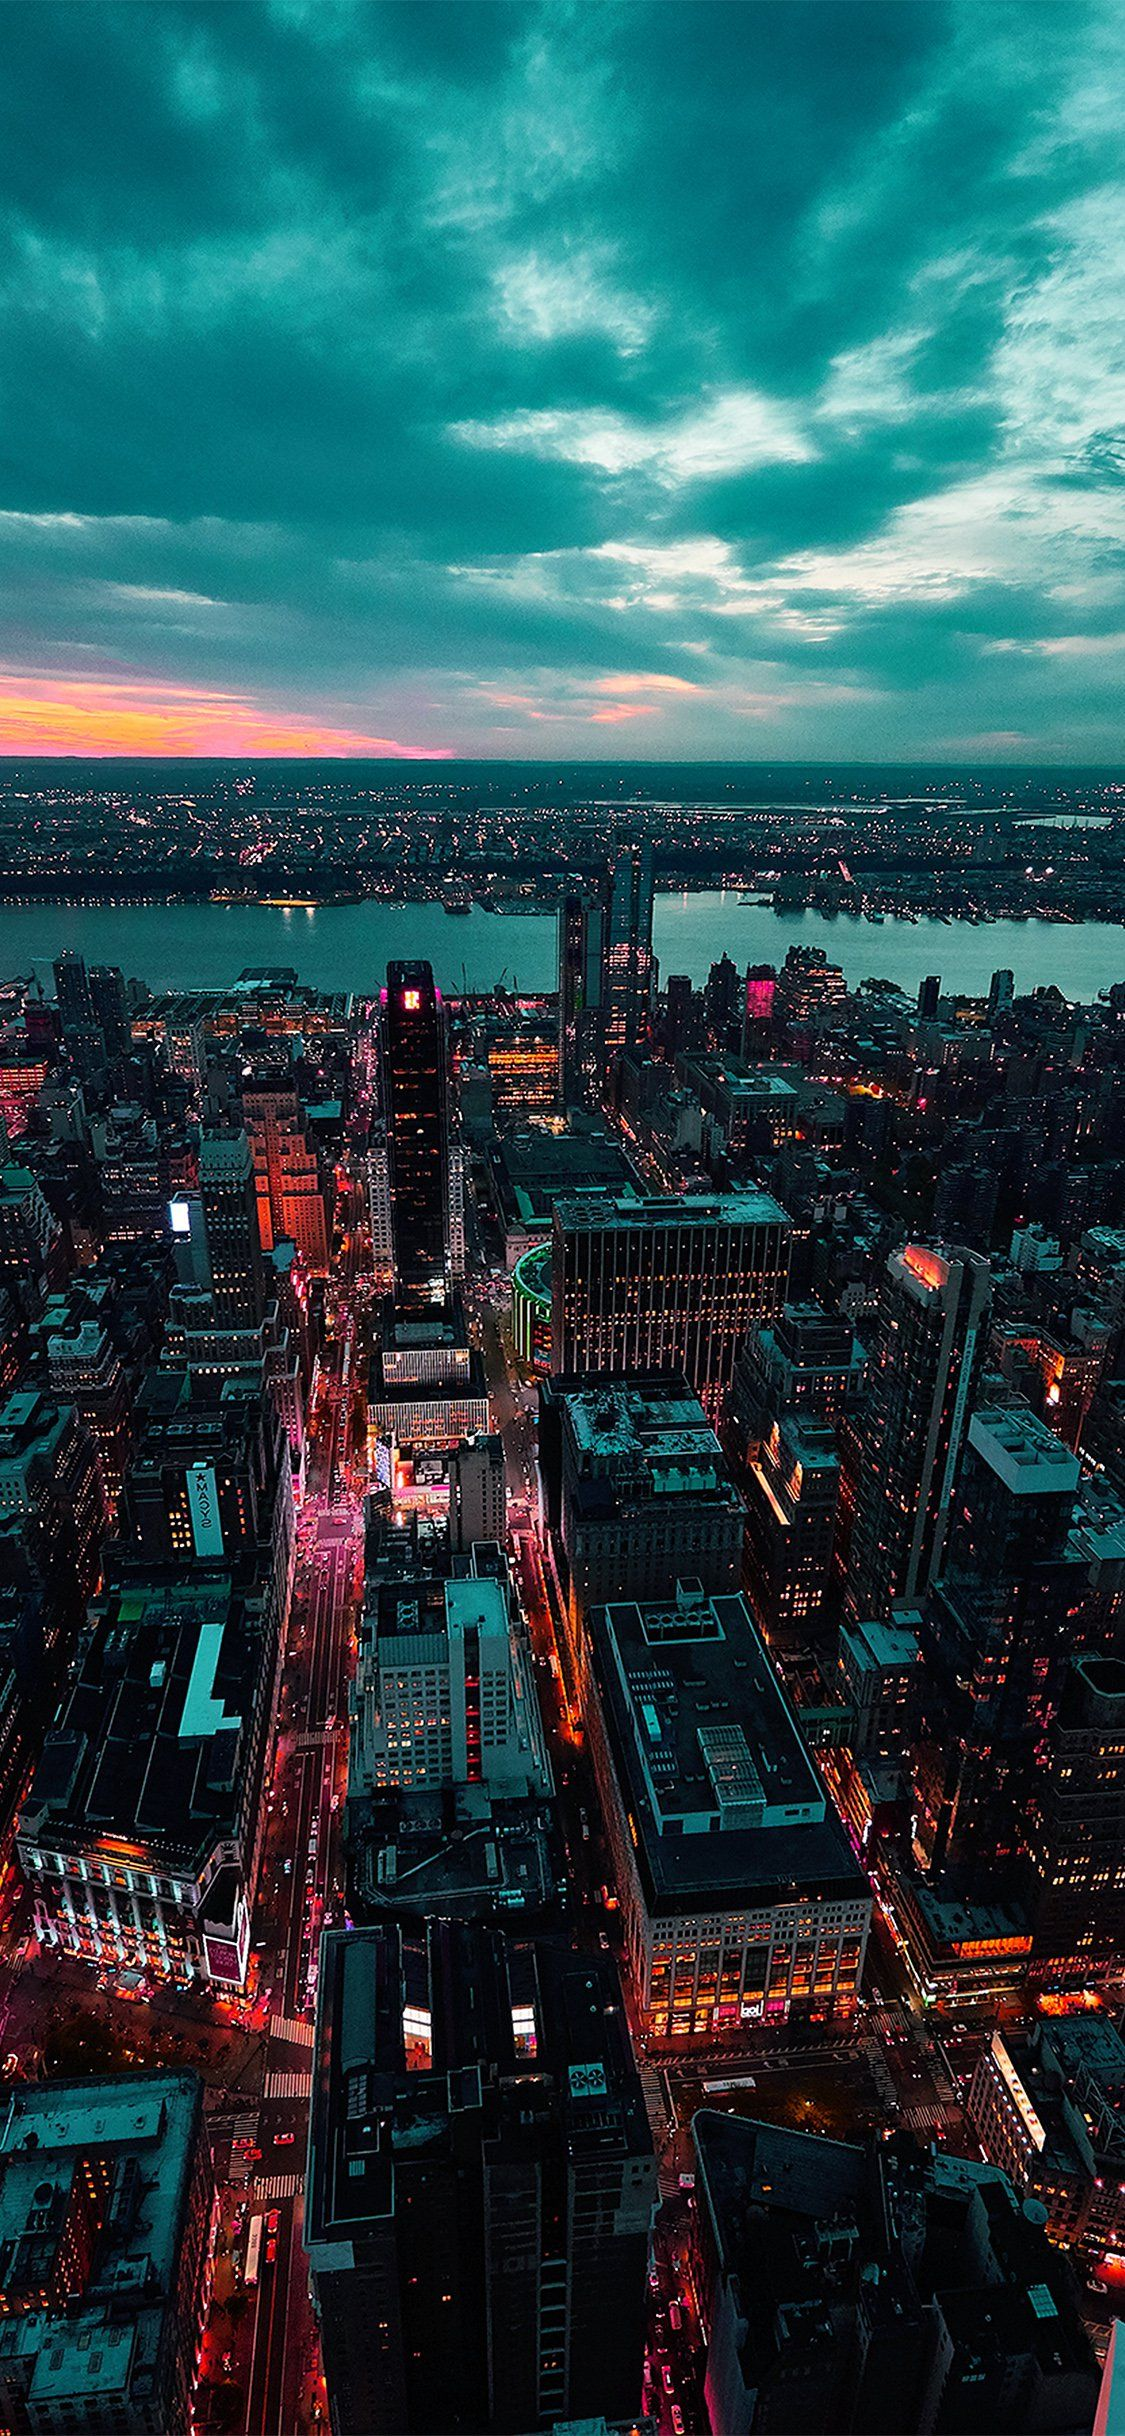 Iphonexpapers Com Apple Iphone Wallpaper Ne53 City View Sunset River Sky Cloud Nature Green Red City Aesthetic Sunset Iphone Wallpaper City Iphone Wallpaper